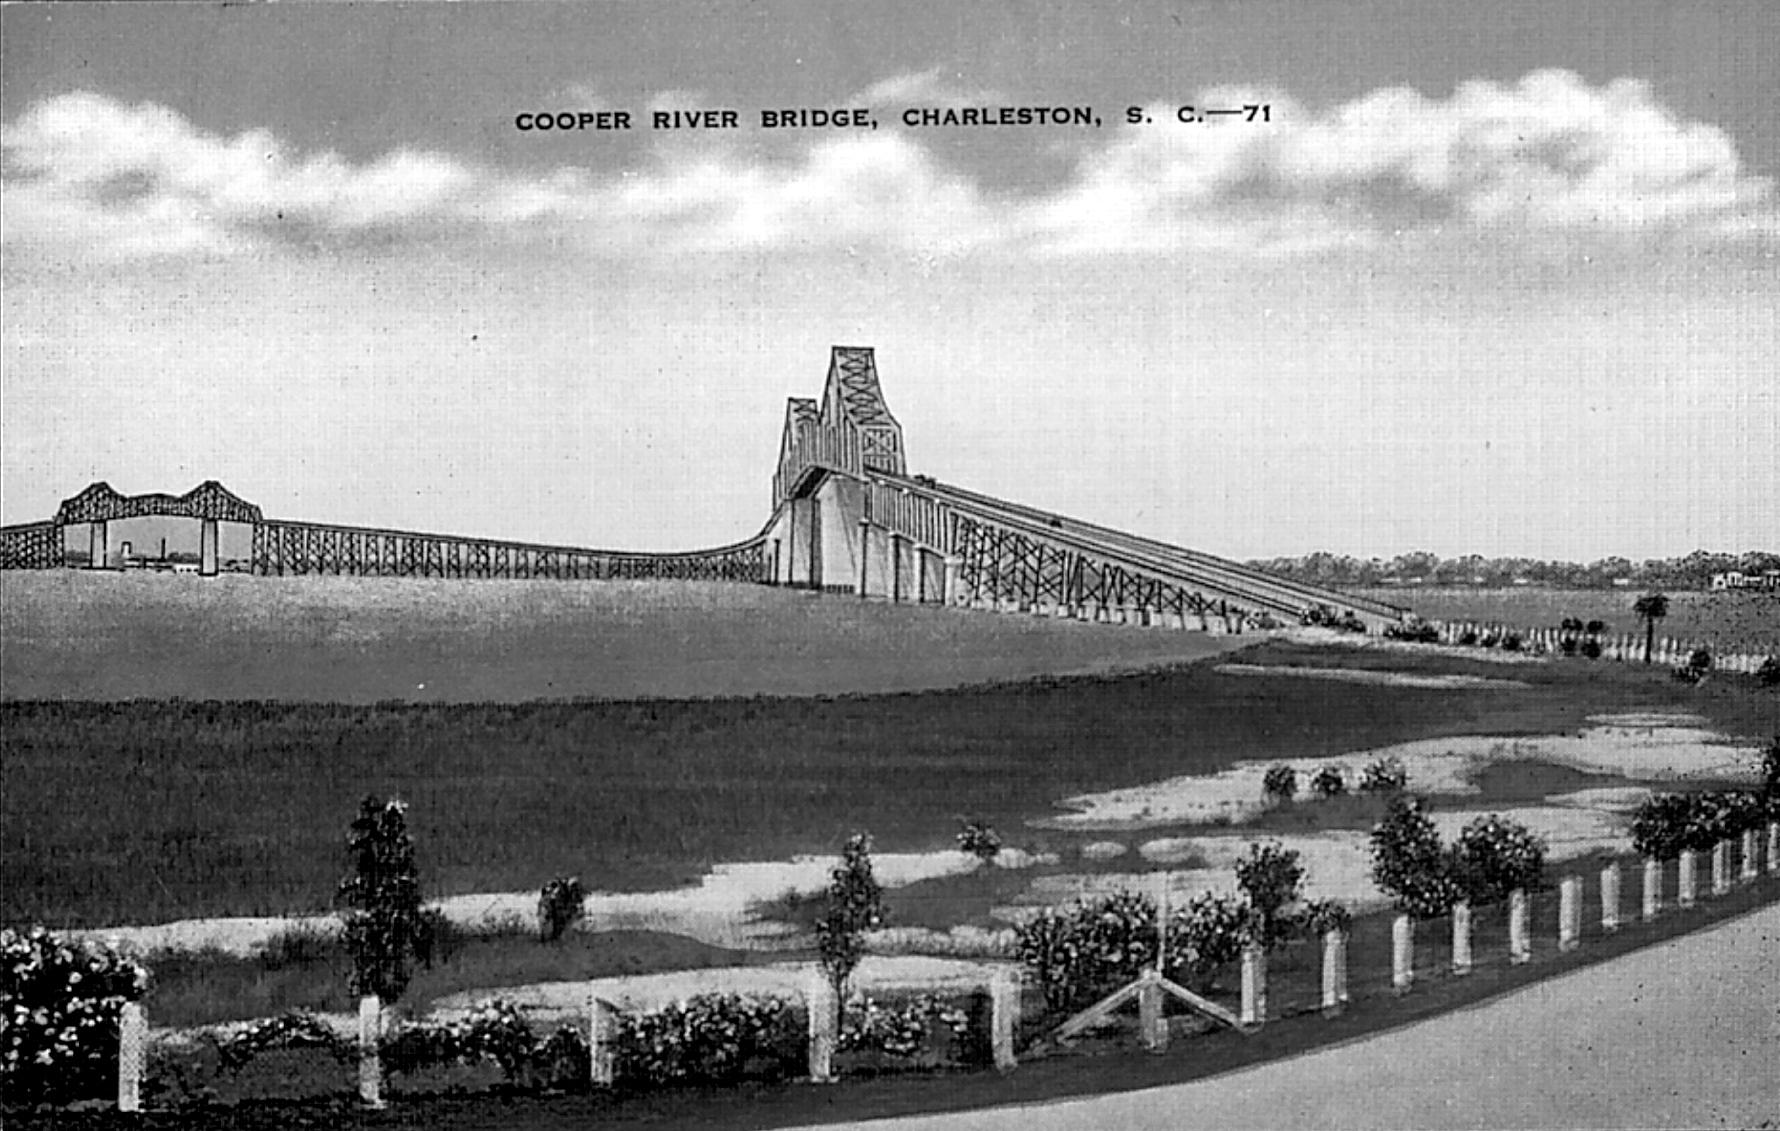 Old Cooper River Bridge Card - Mount Pleasant Side